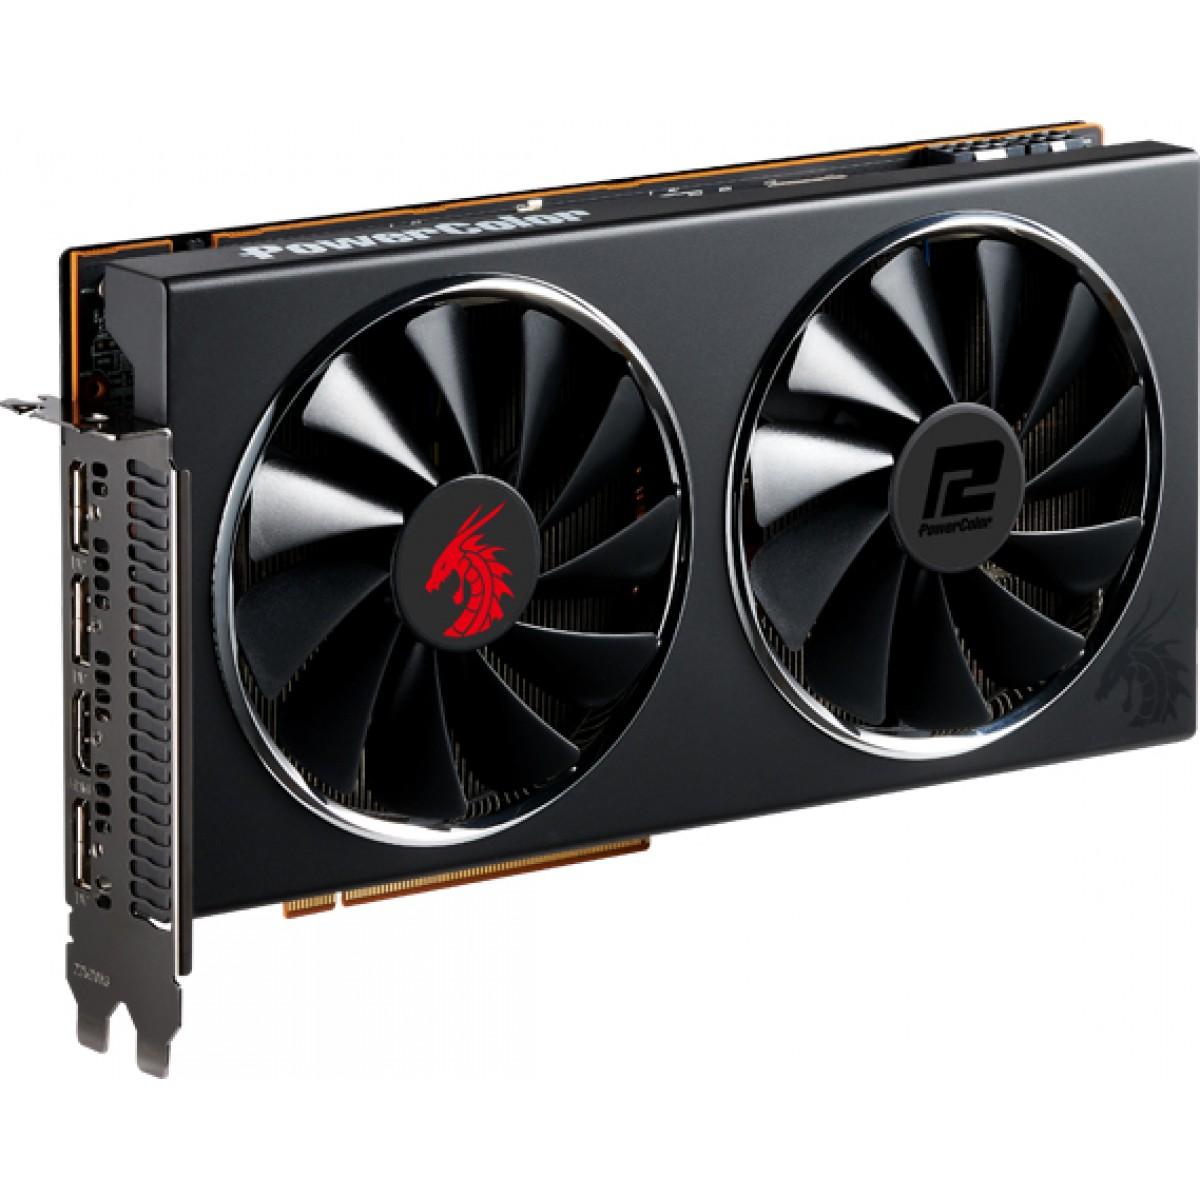 Placa de Vídeo PowerColor Radeon Navi RX 5700 Red Dragon, 8GB GDDR6, 256Bit, AXRX 5700 8GBD6-3DHR/OC